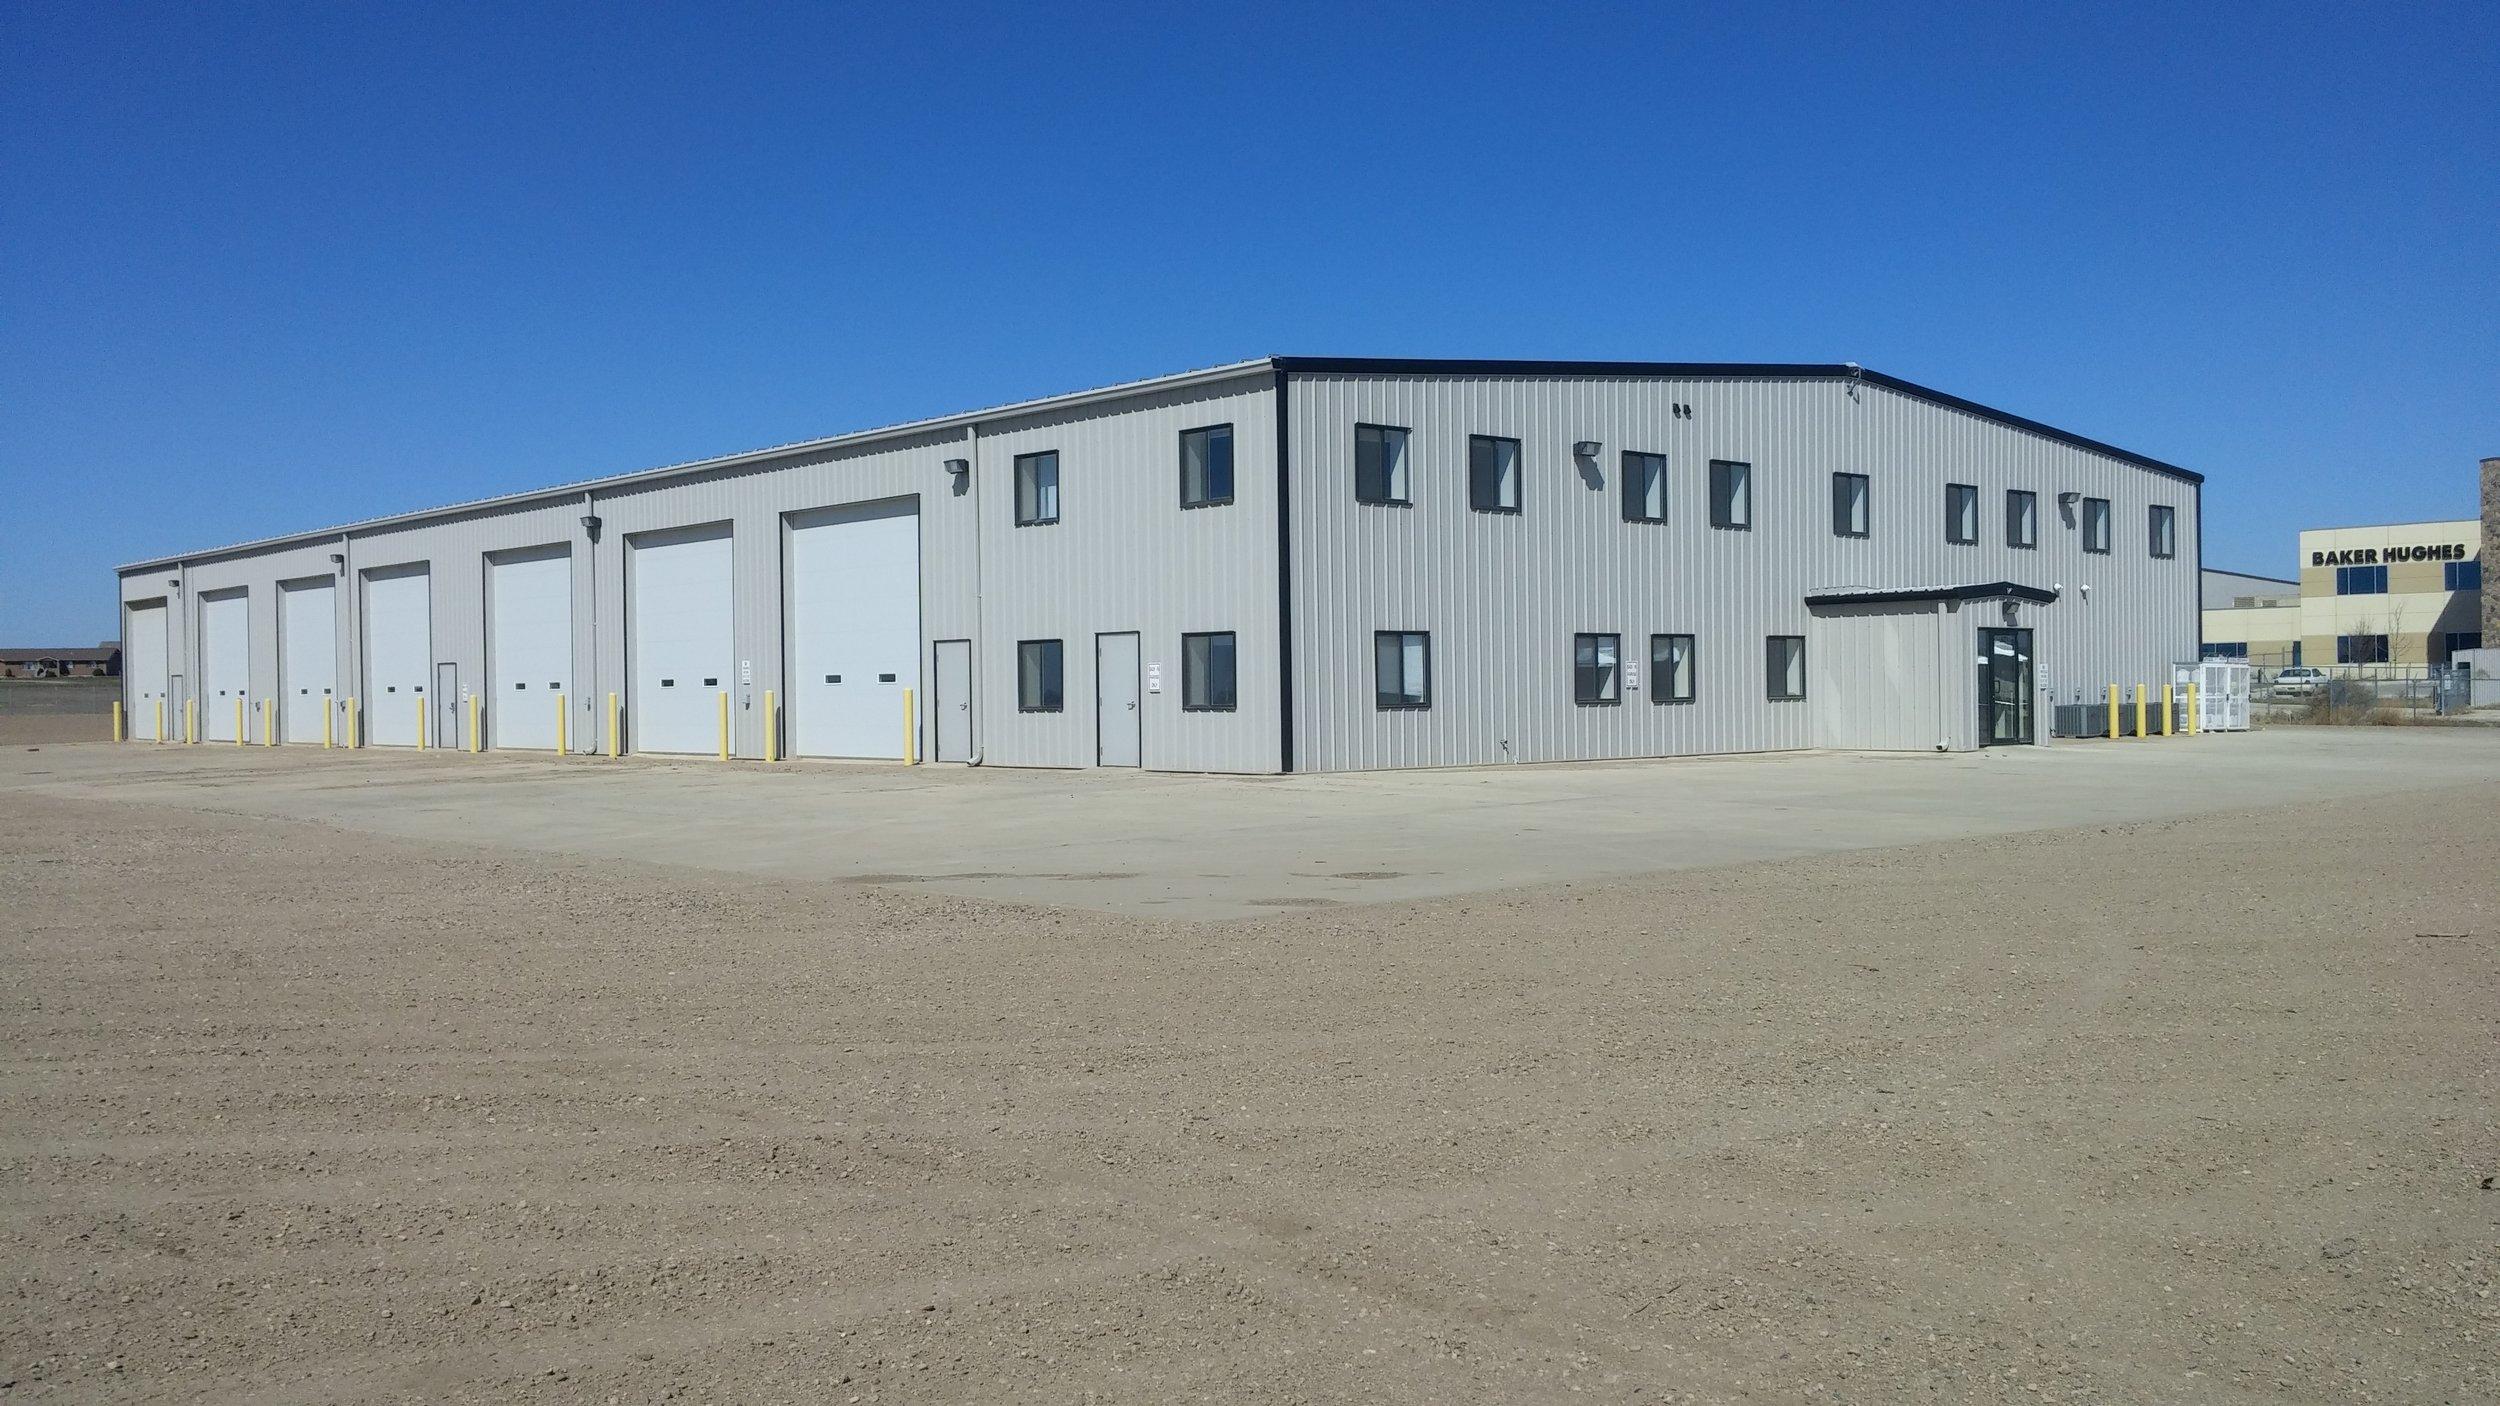 23,750 Warehouse & Office